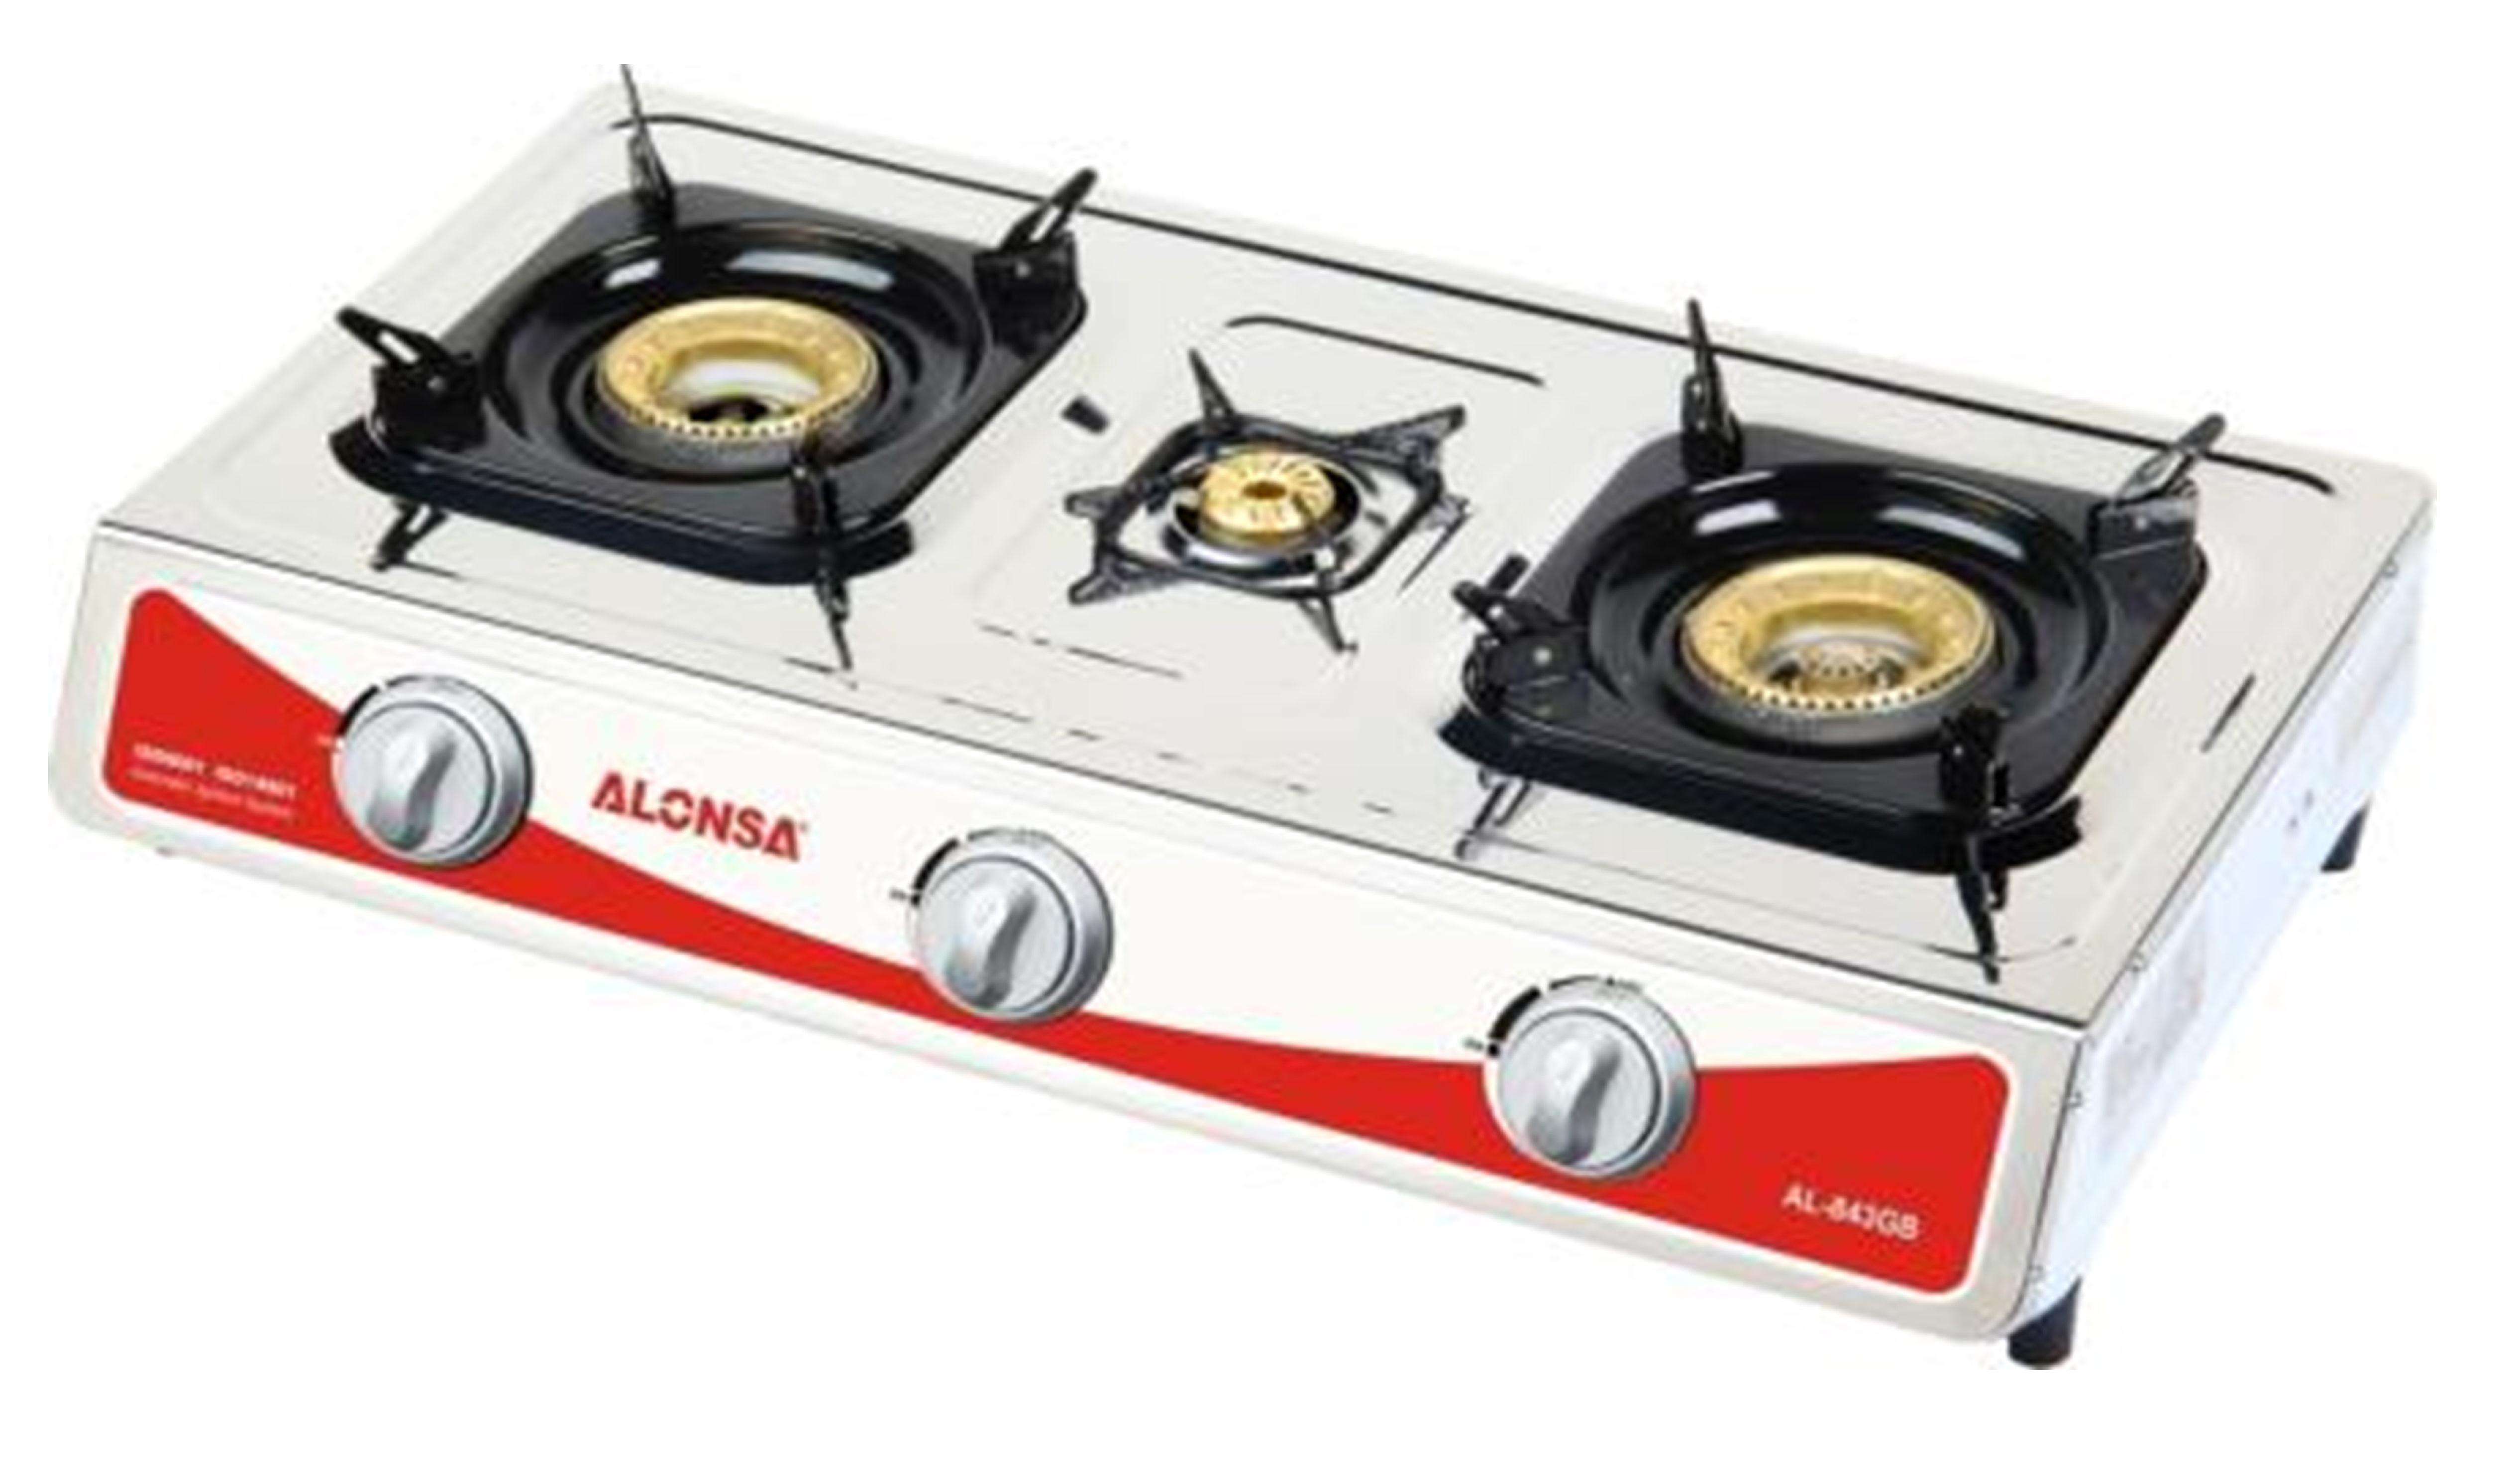 Alonsa Table Top 3 Gas Burner - Stainless Steel , AL-944 GB FFD